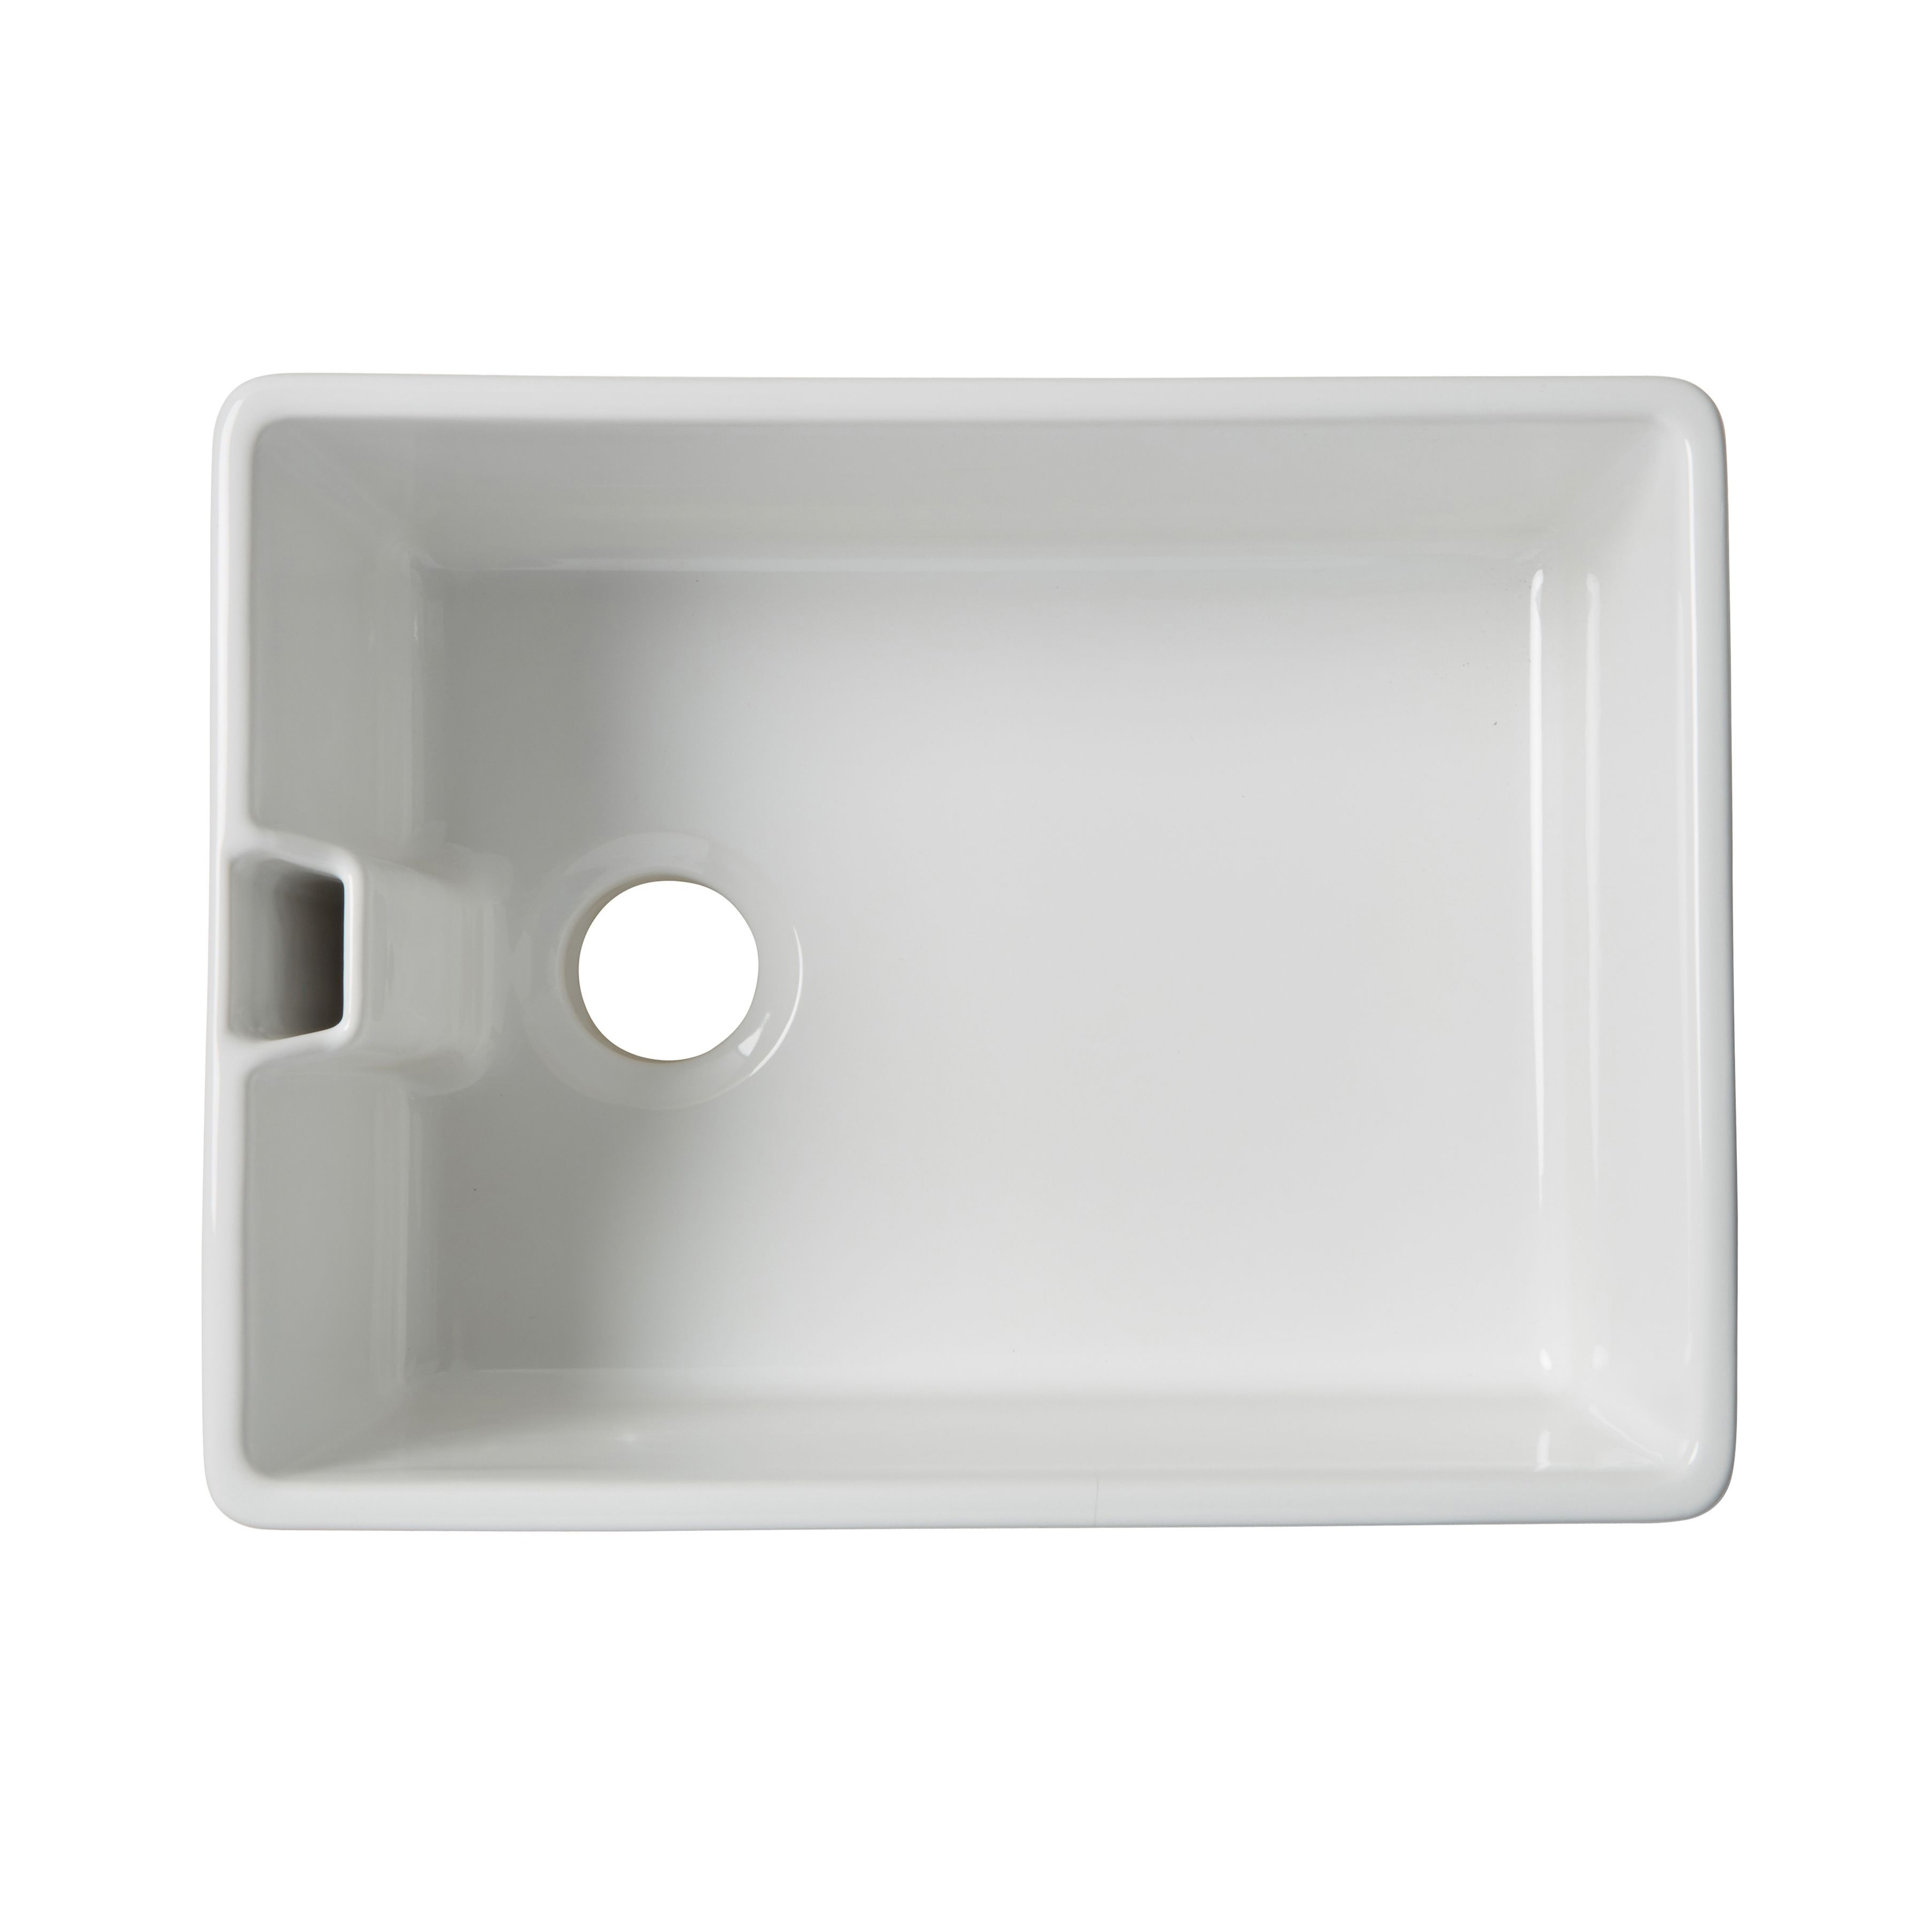 Cooke & Lewis Chadwick 1 bowl White Ceramic Belfast sink | House ...